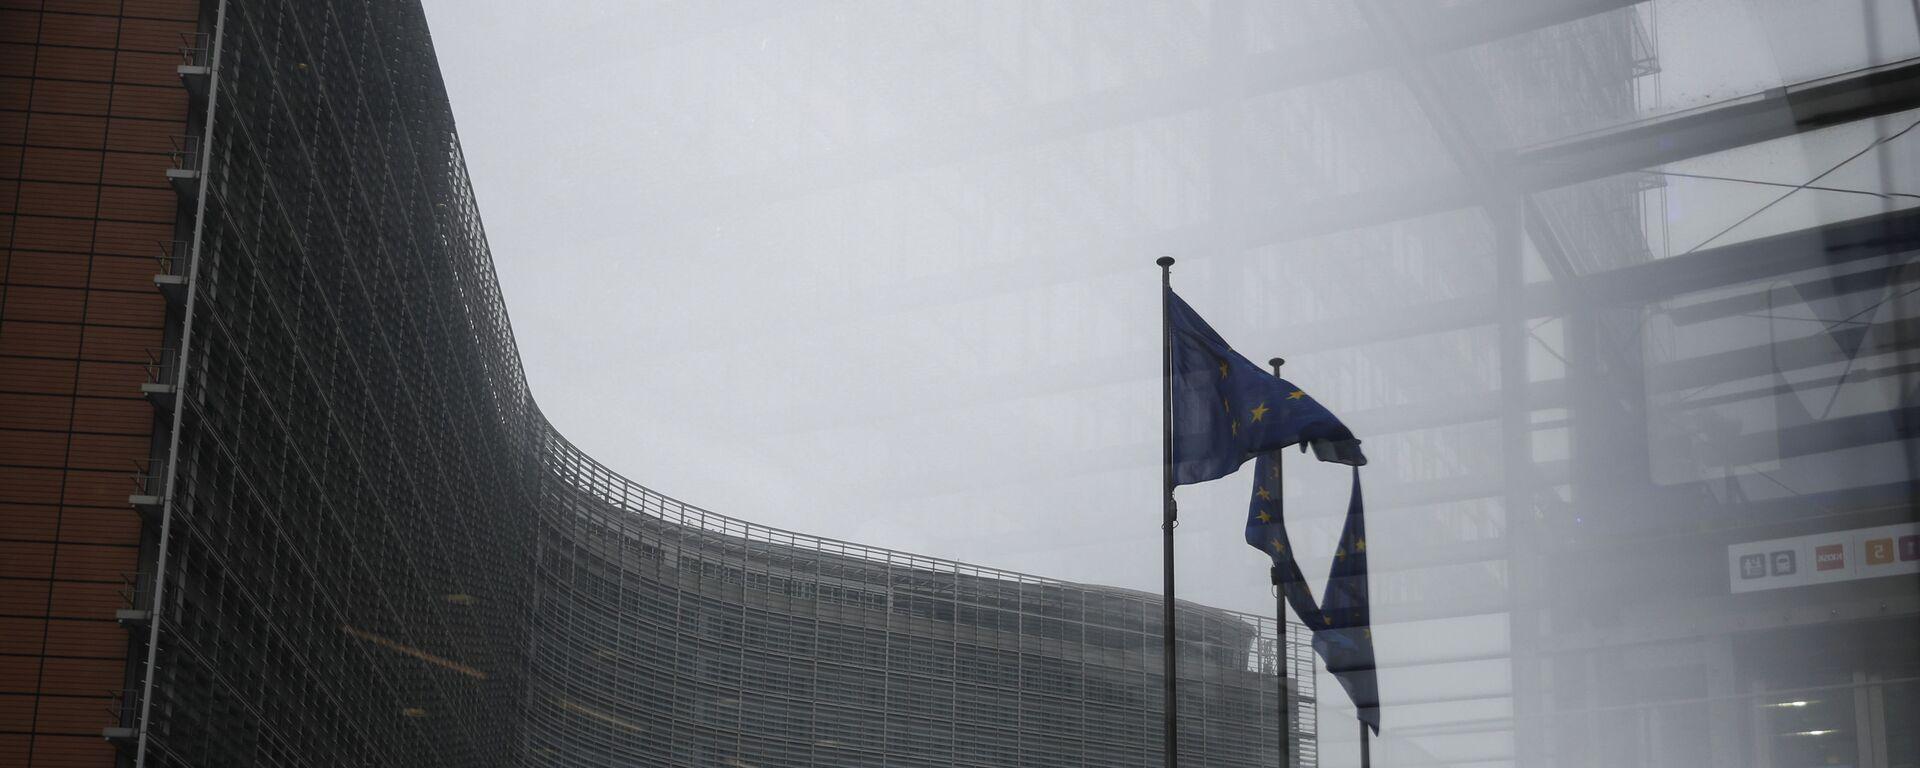 Komisja Europejska, Bruksela - Sputnik Polska, 1920, 05.06.2021